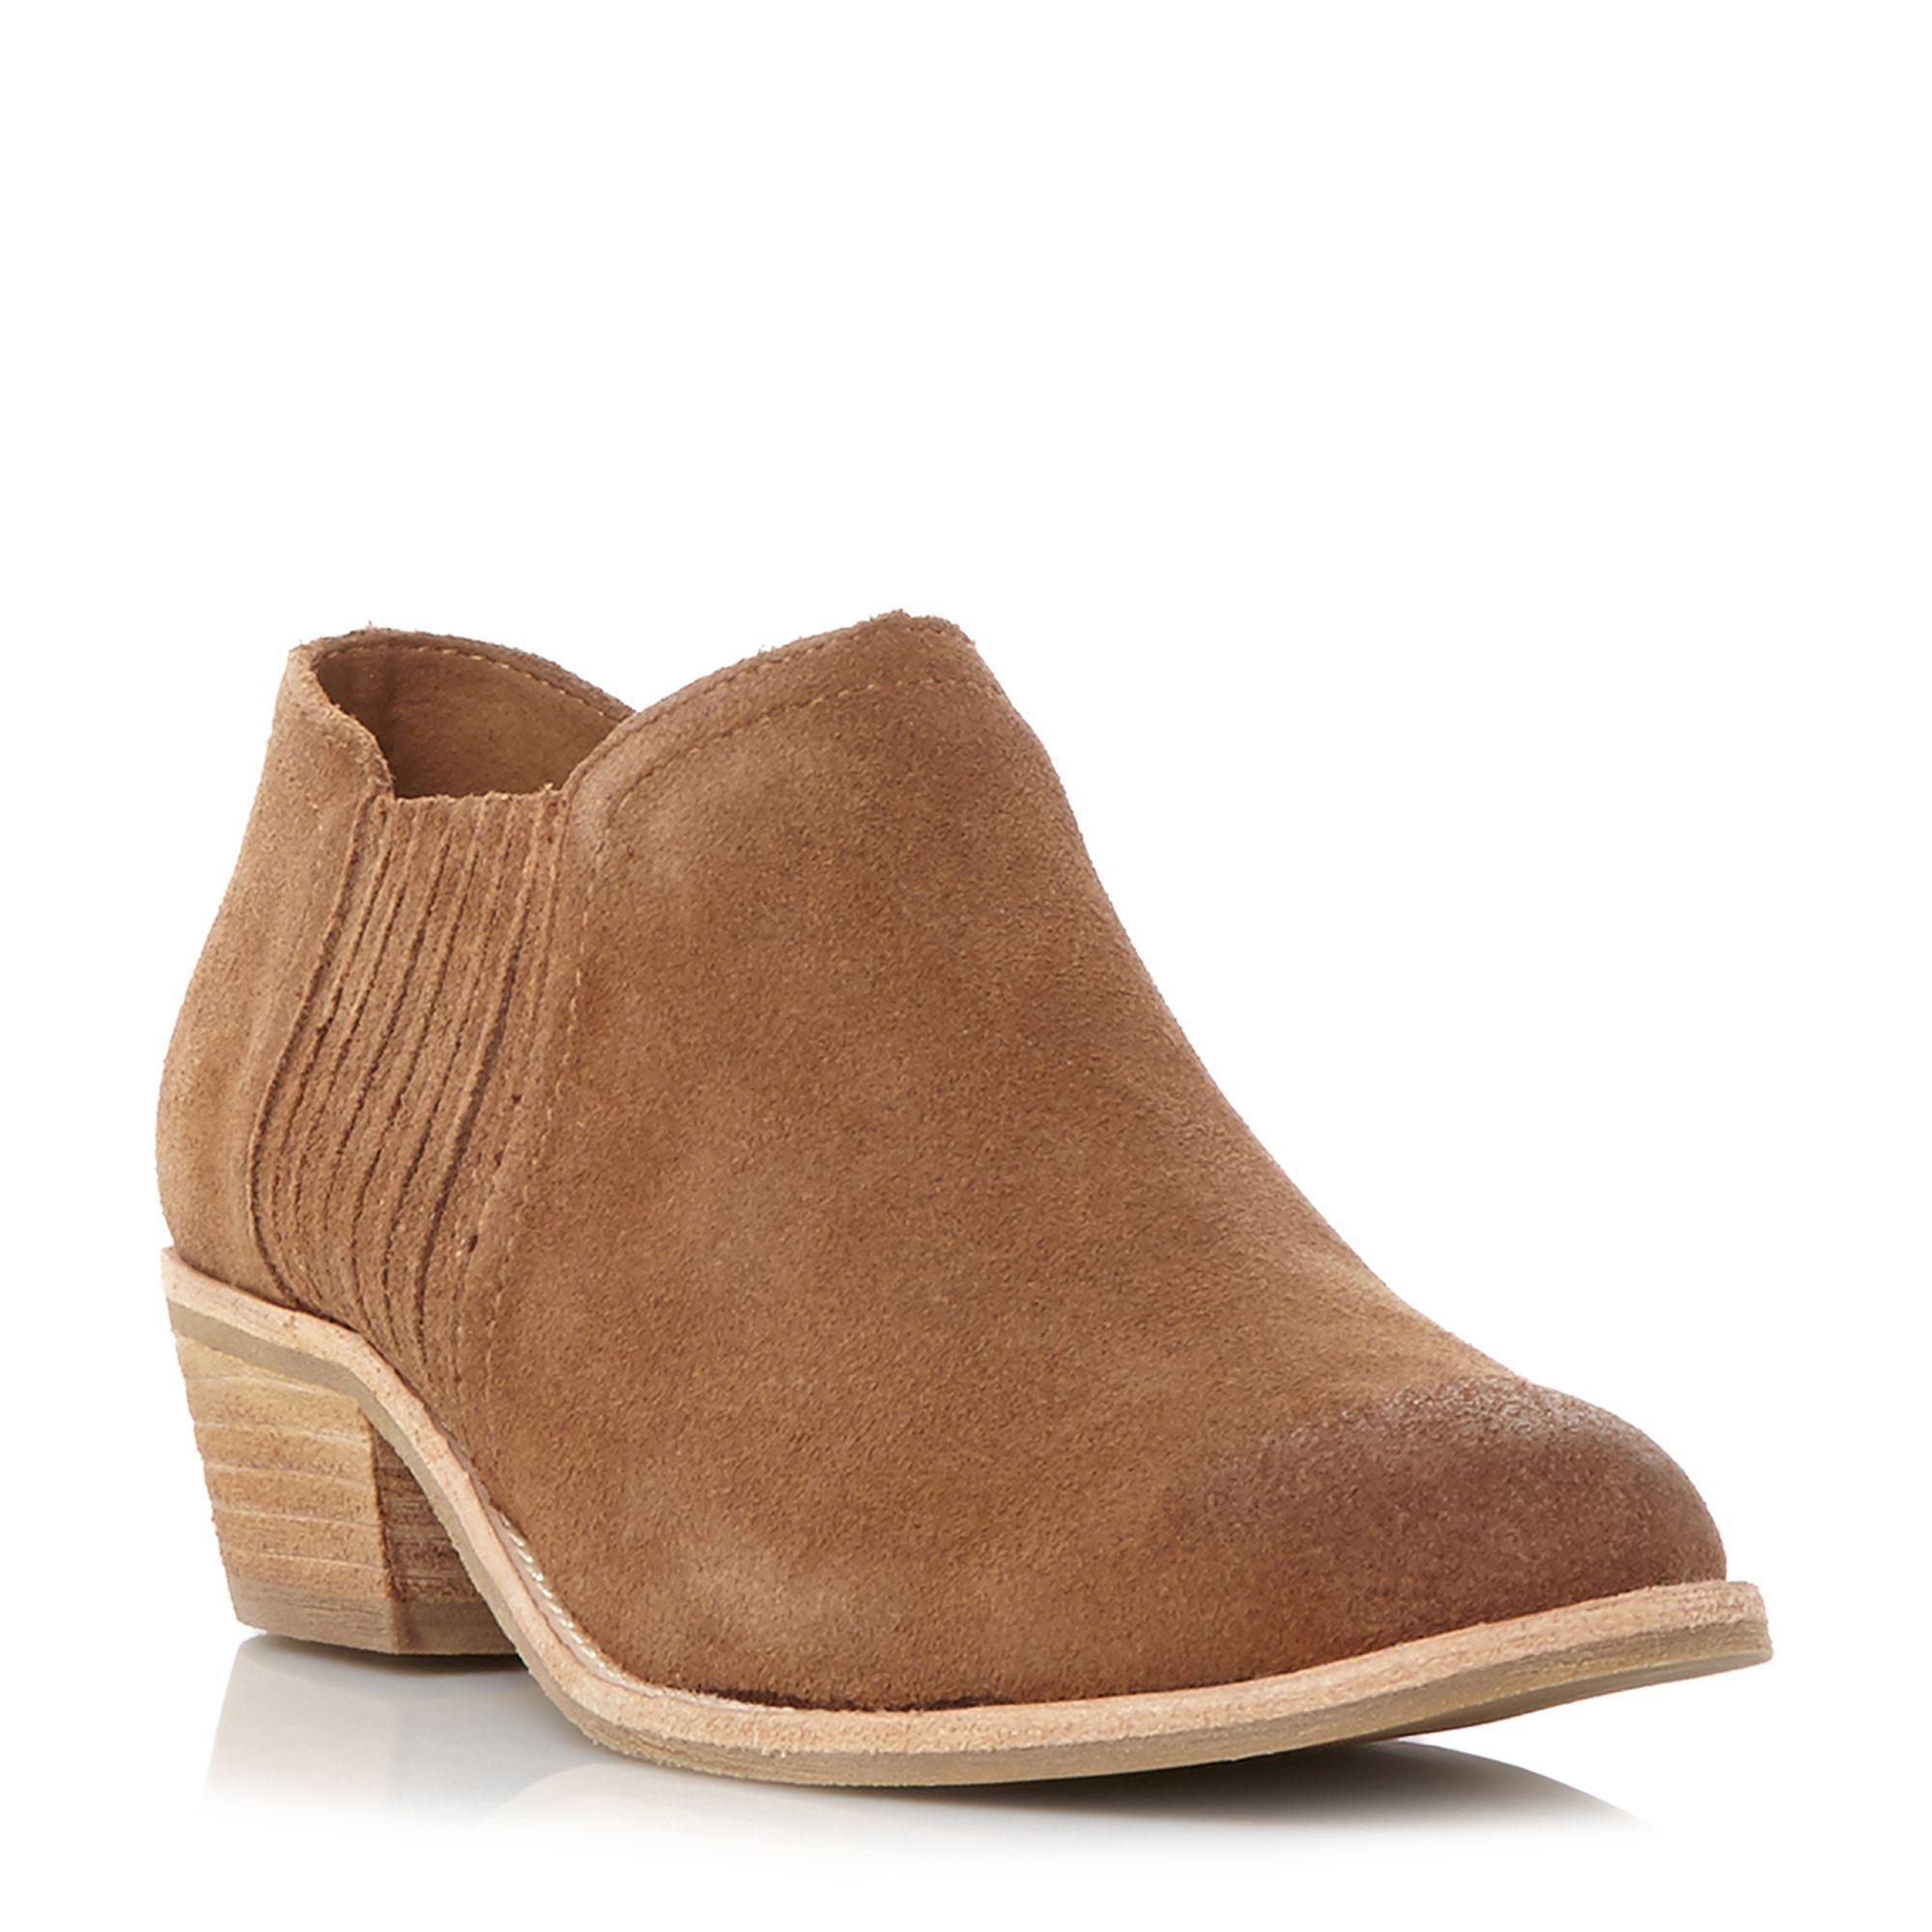 9e65661fcd2 Lyst - Steve Madden Court Gussett Detail Shoe Boots